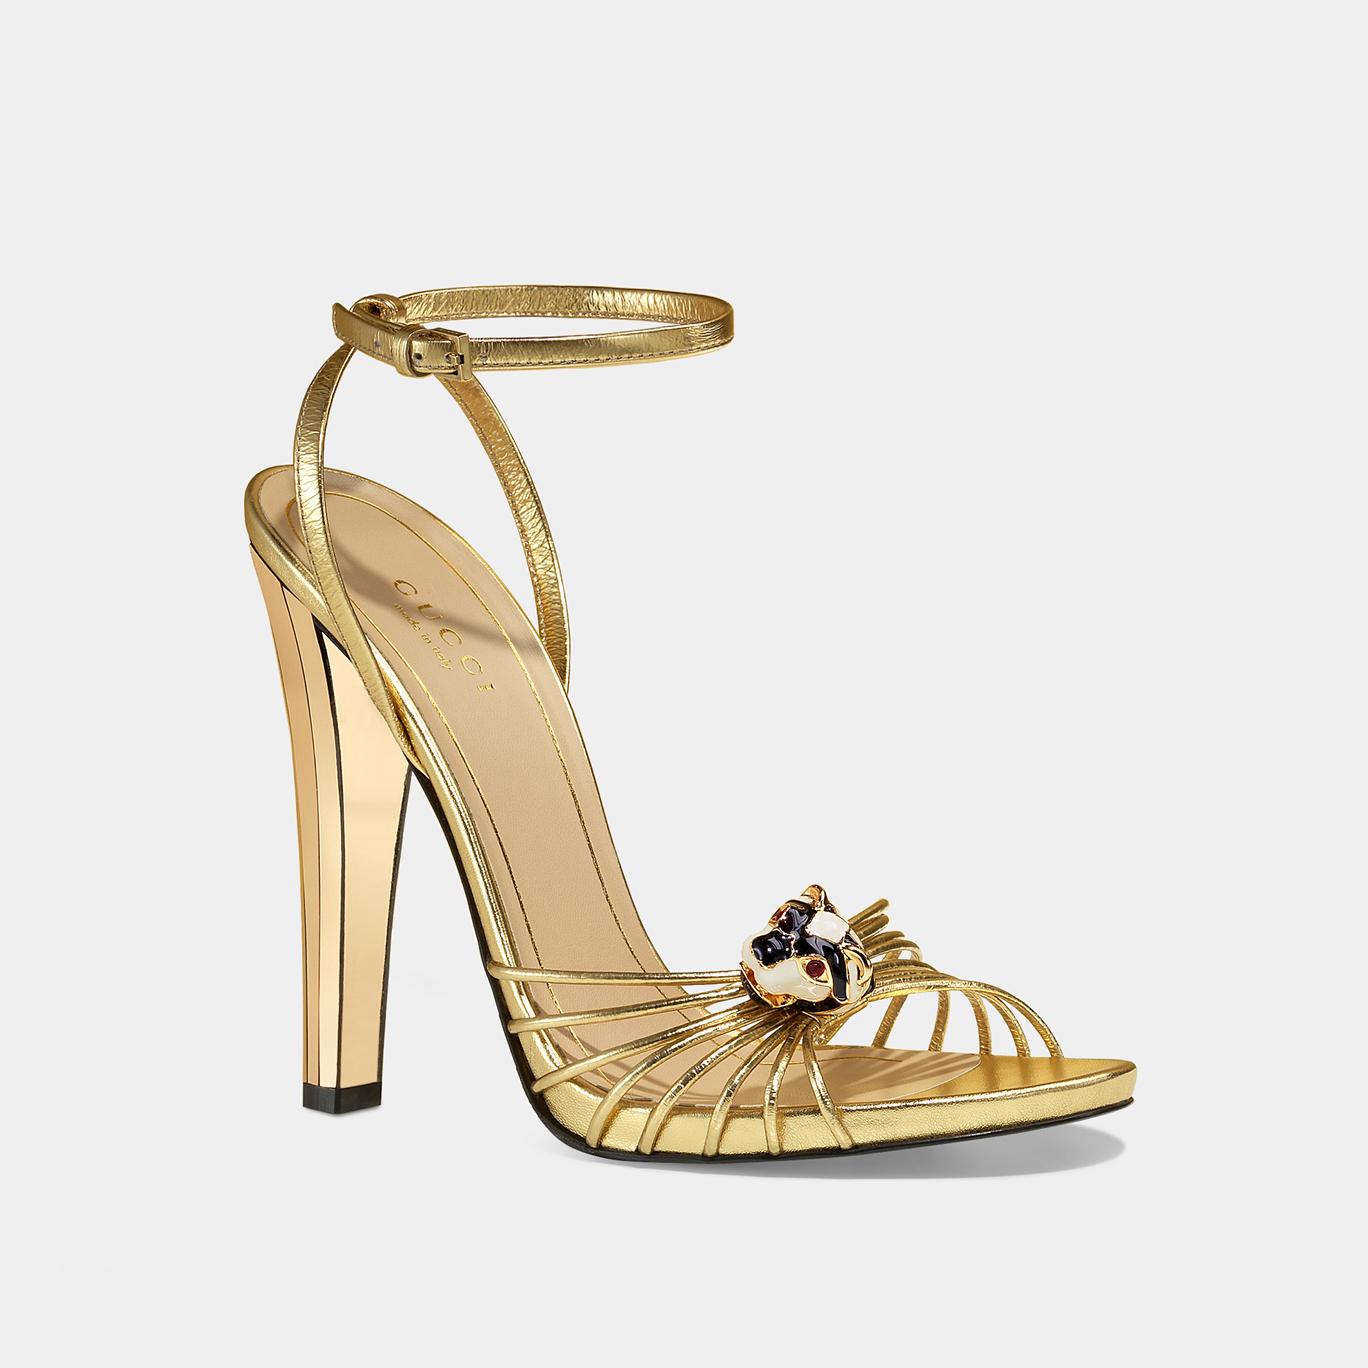 GUCCI金色高跟凉鞋